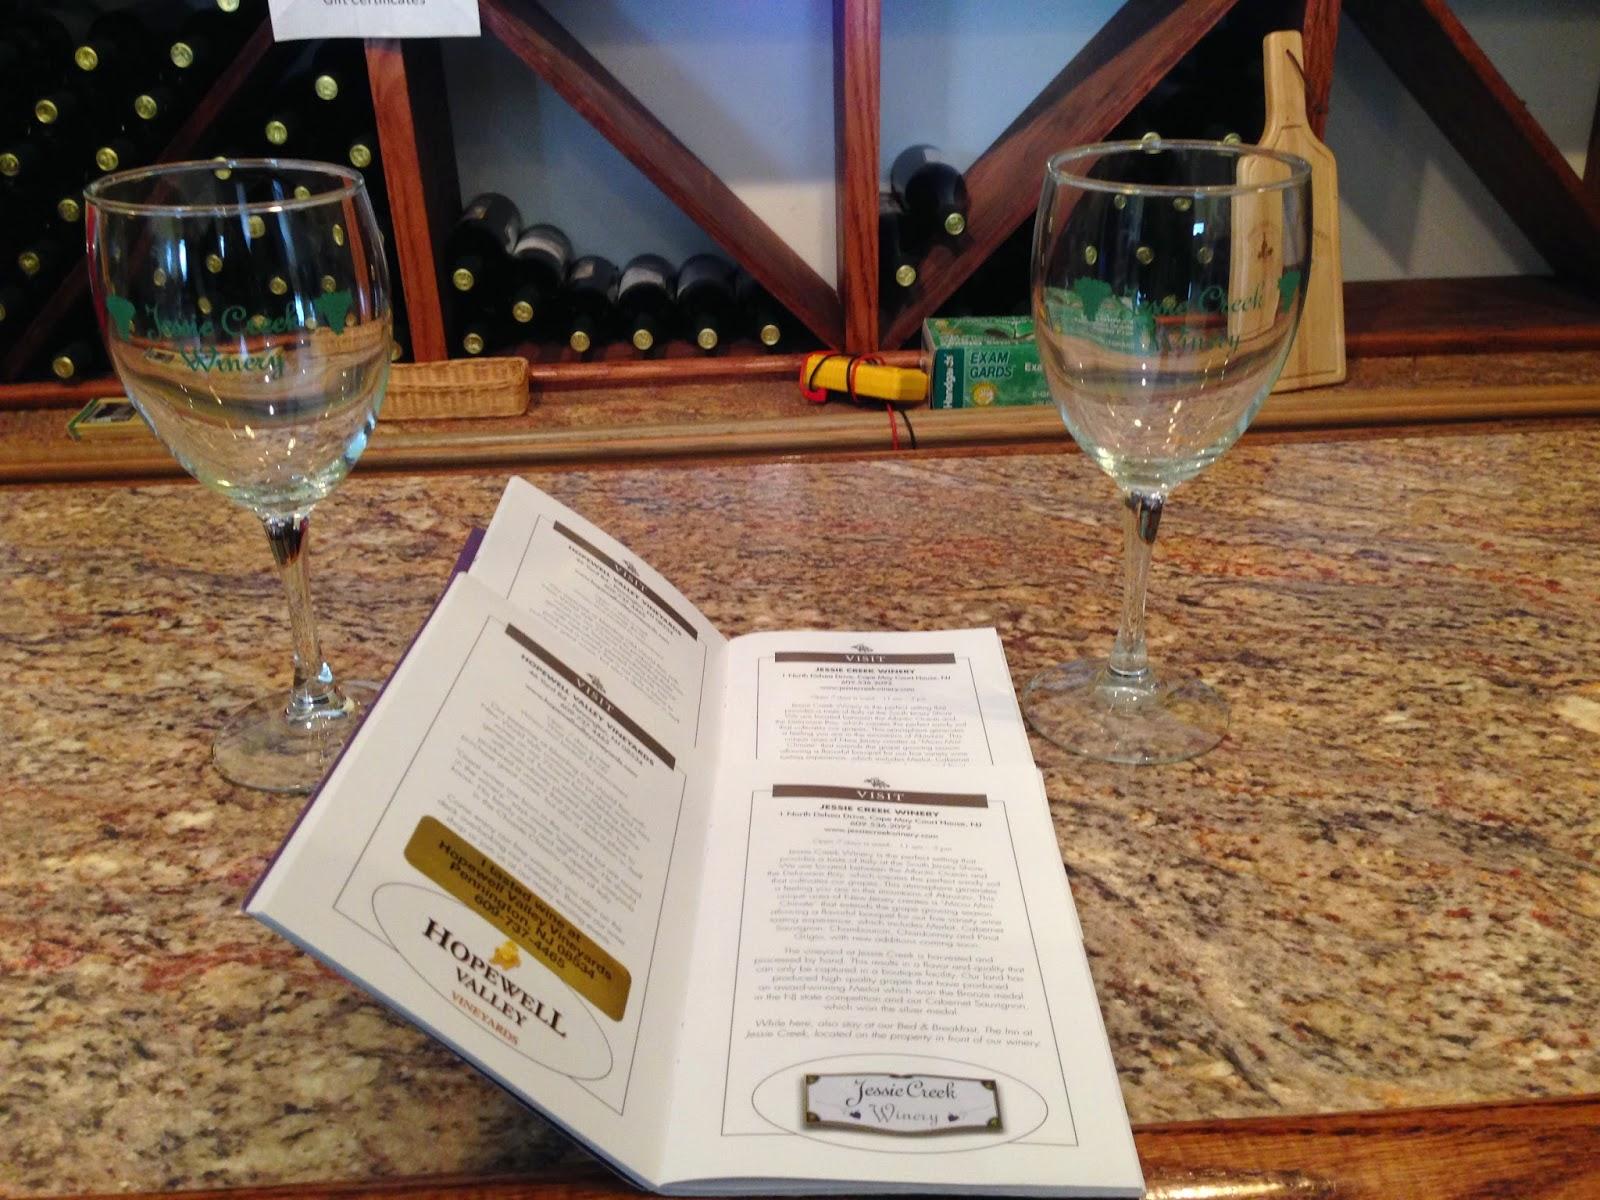 cape may wine trail - Jessie Creek Winery